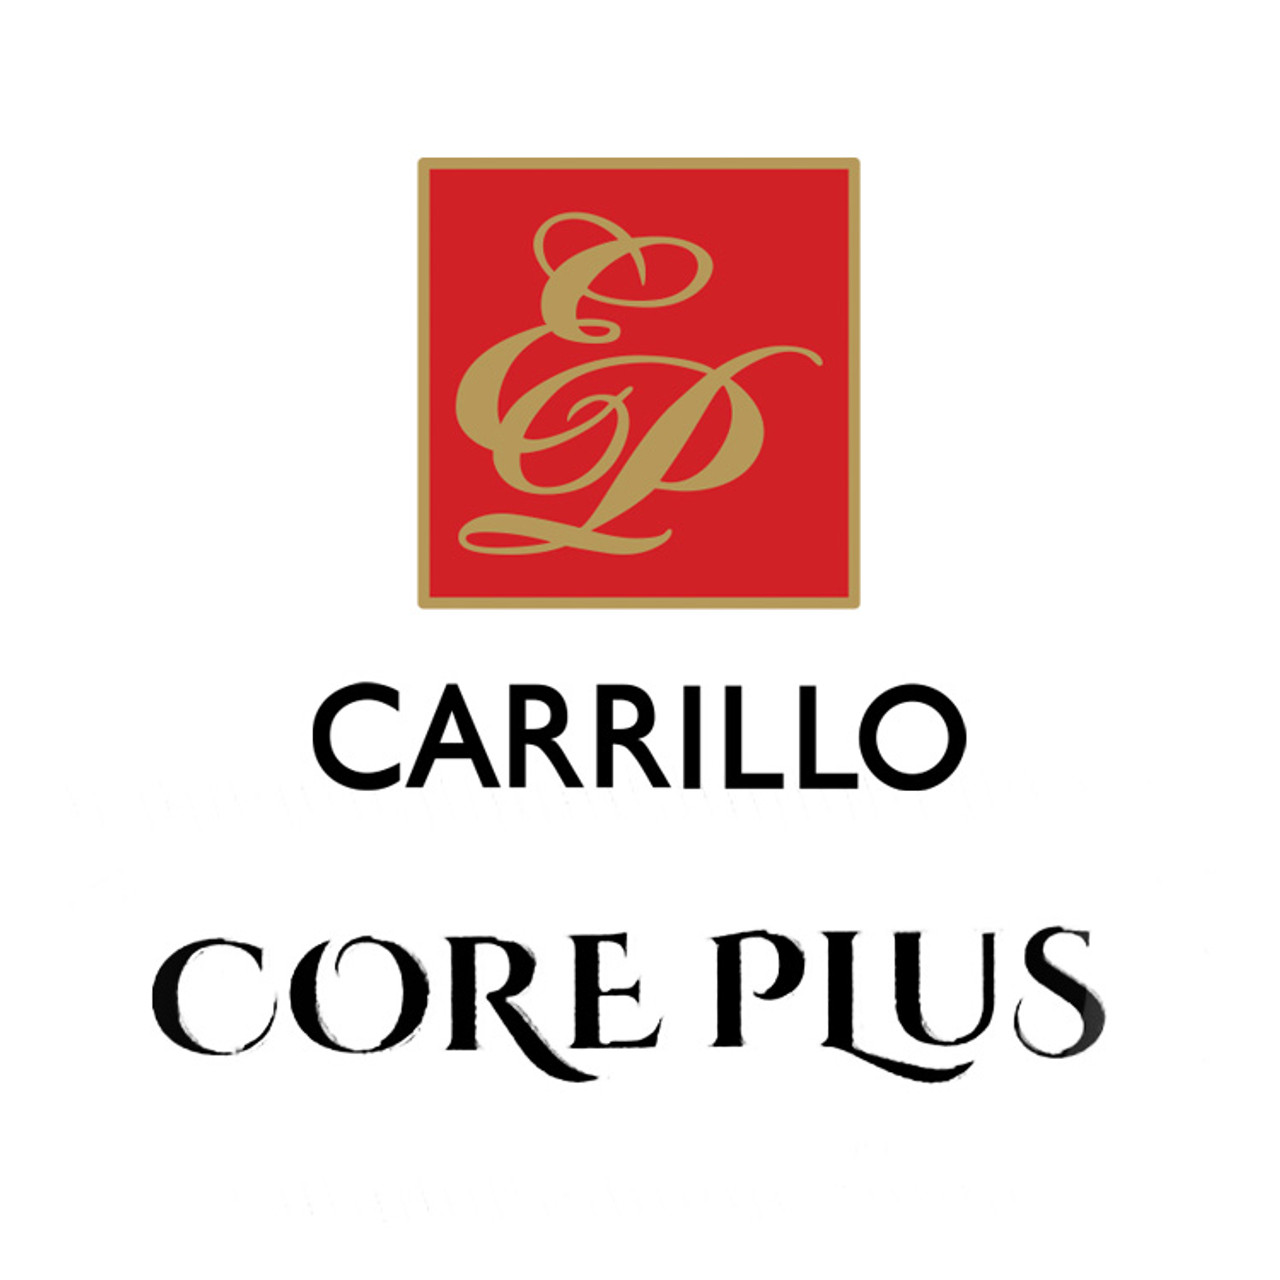 E.P. Carrillo Core Plus Encantos Cigars - 5 x 50 (Box of 20)